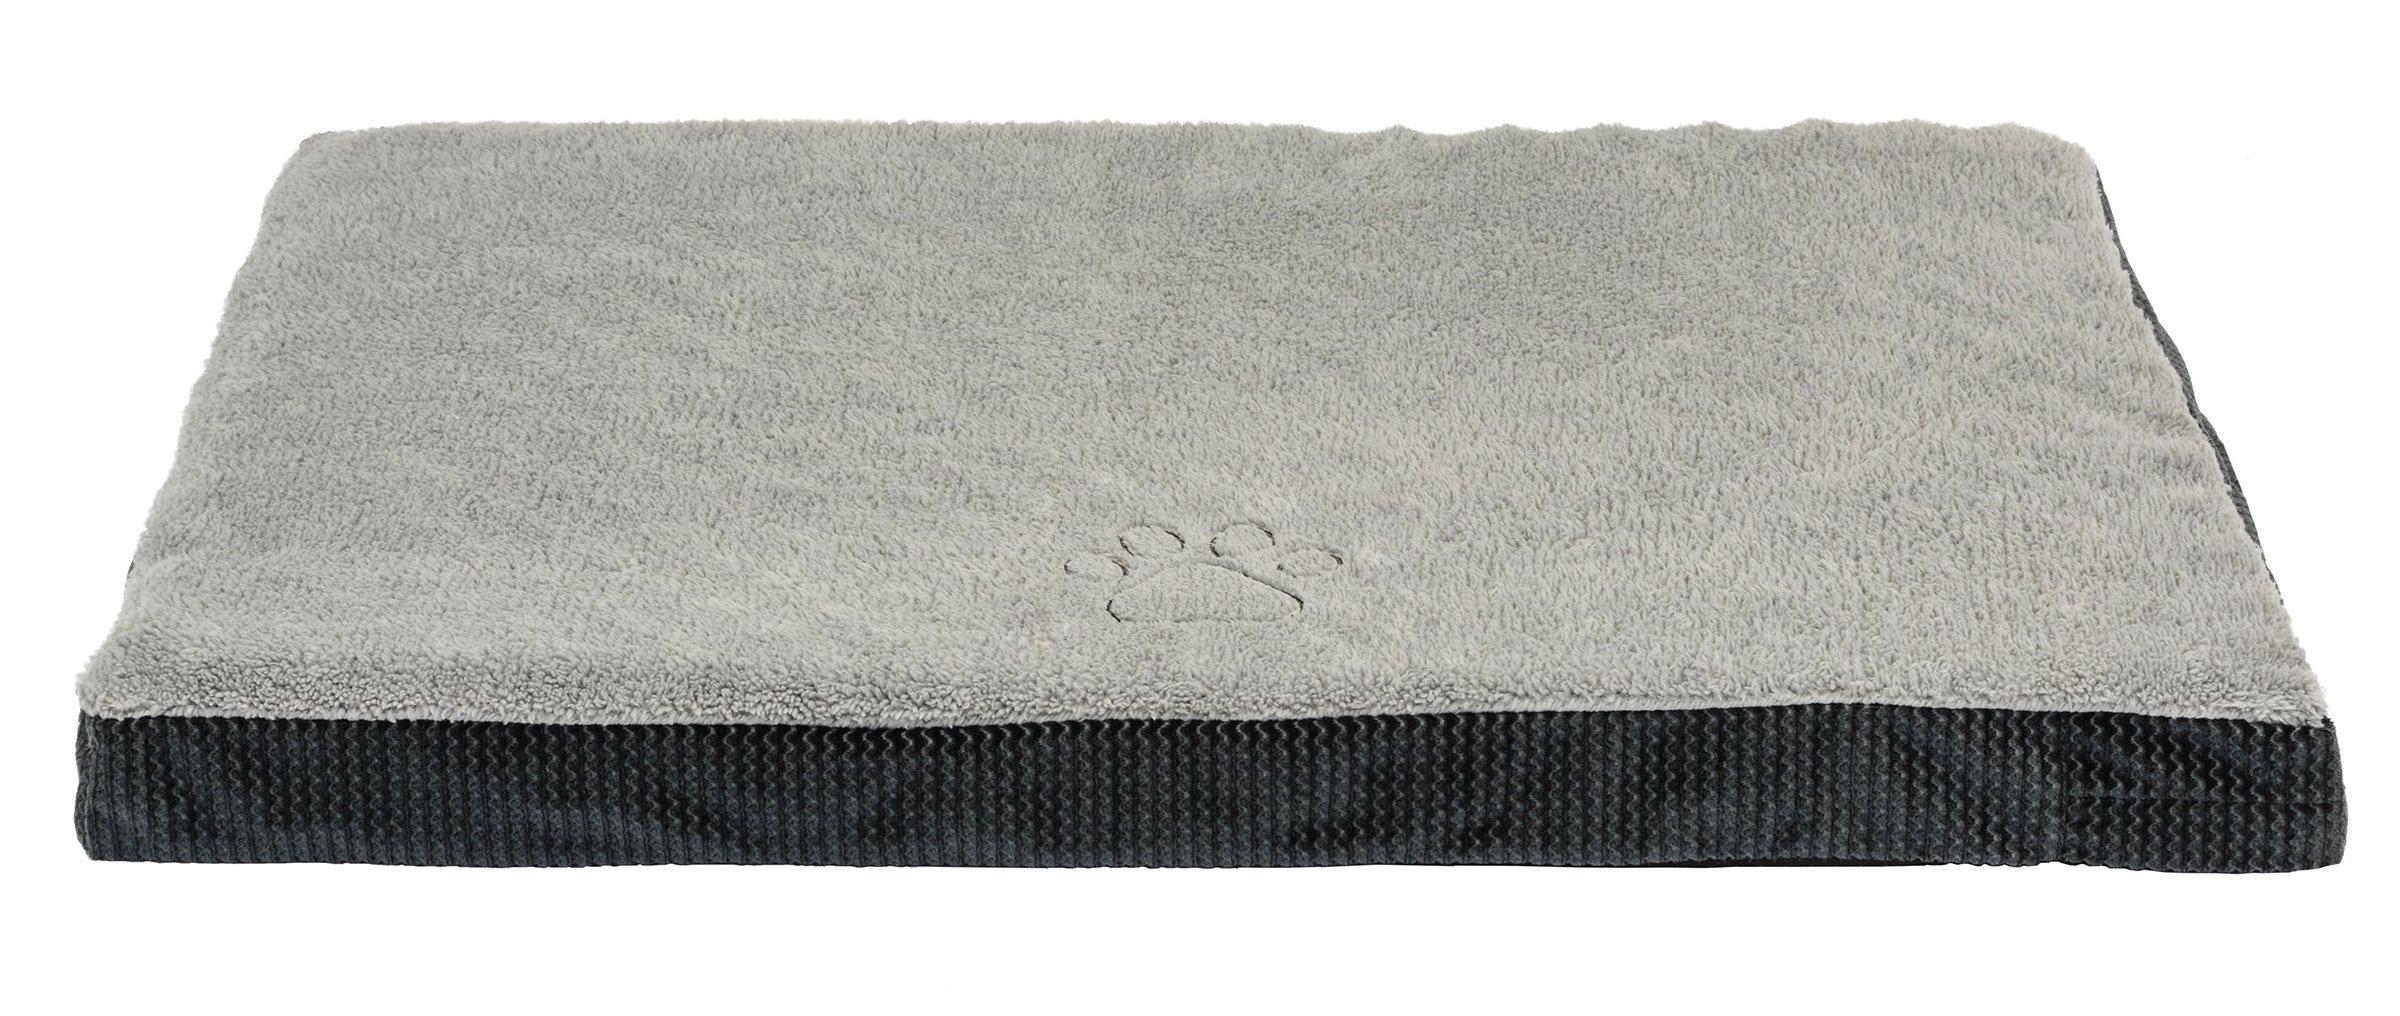 Dallas Co. Premium Orthopedic 36'' x 45'', Grey